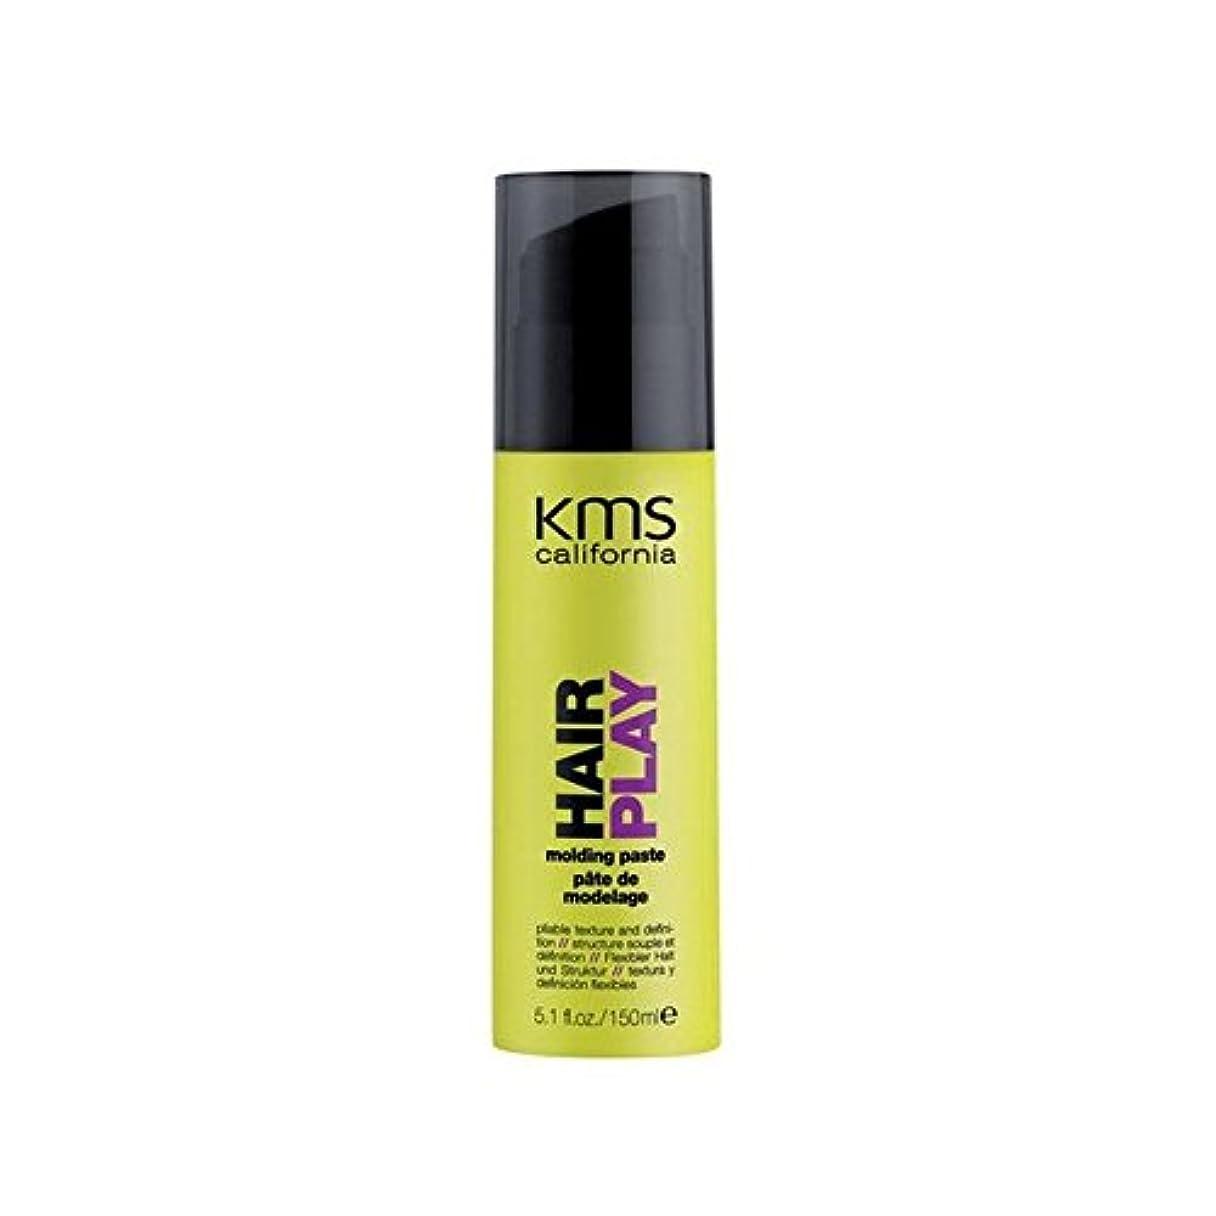 Kms California Hairplay Molding Paste (150ml) - カリフォルニア成形ペースト(150ミリリットル) [並行輸入品]